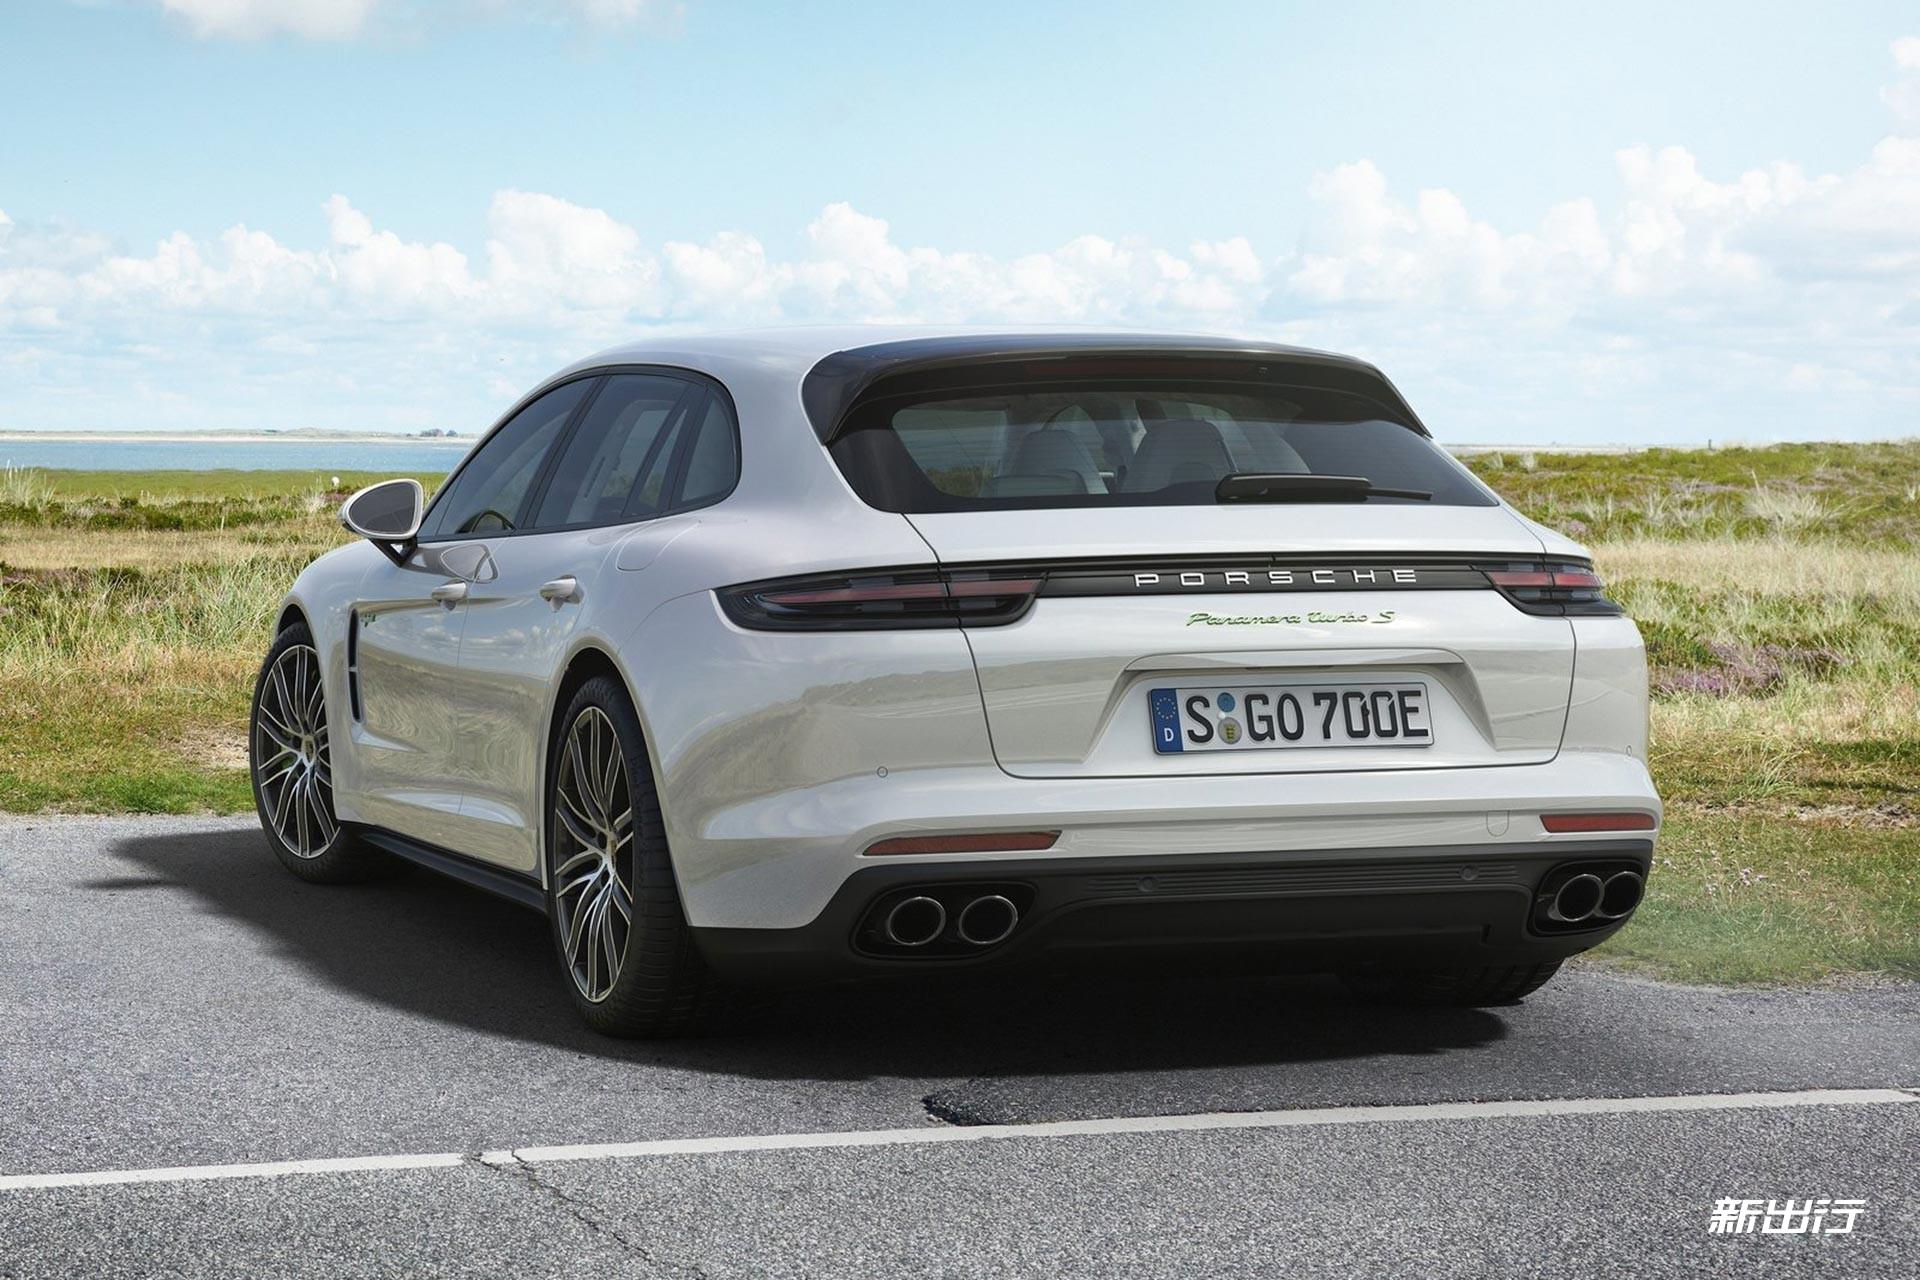 Porsche-Panamera_Turbo_S_E-Hybrid_Sport_Turismo-2018-1600-04.jpg